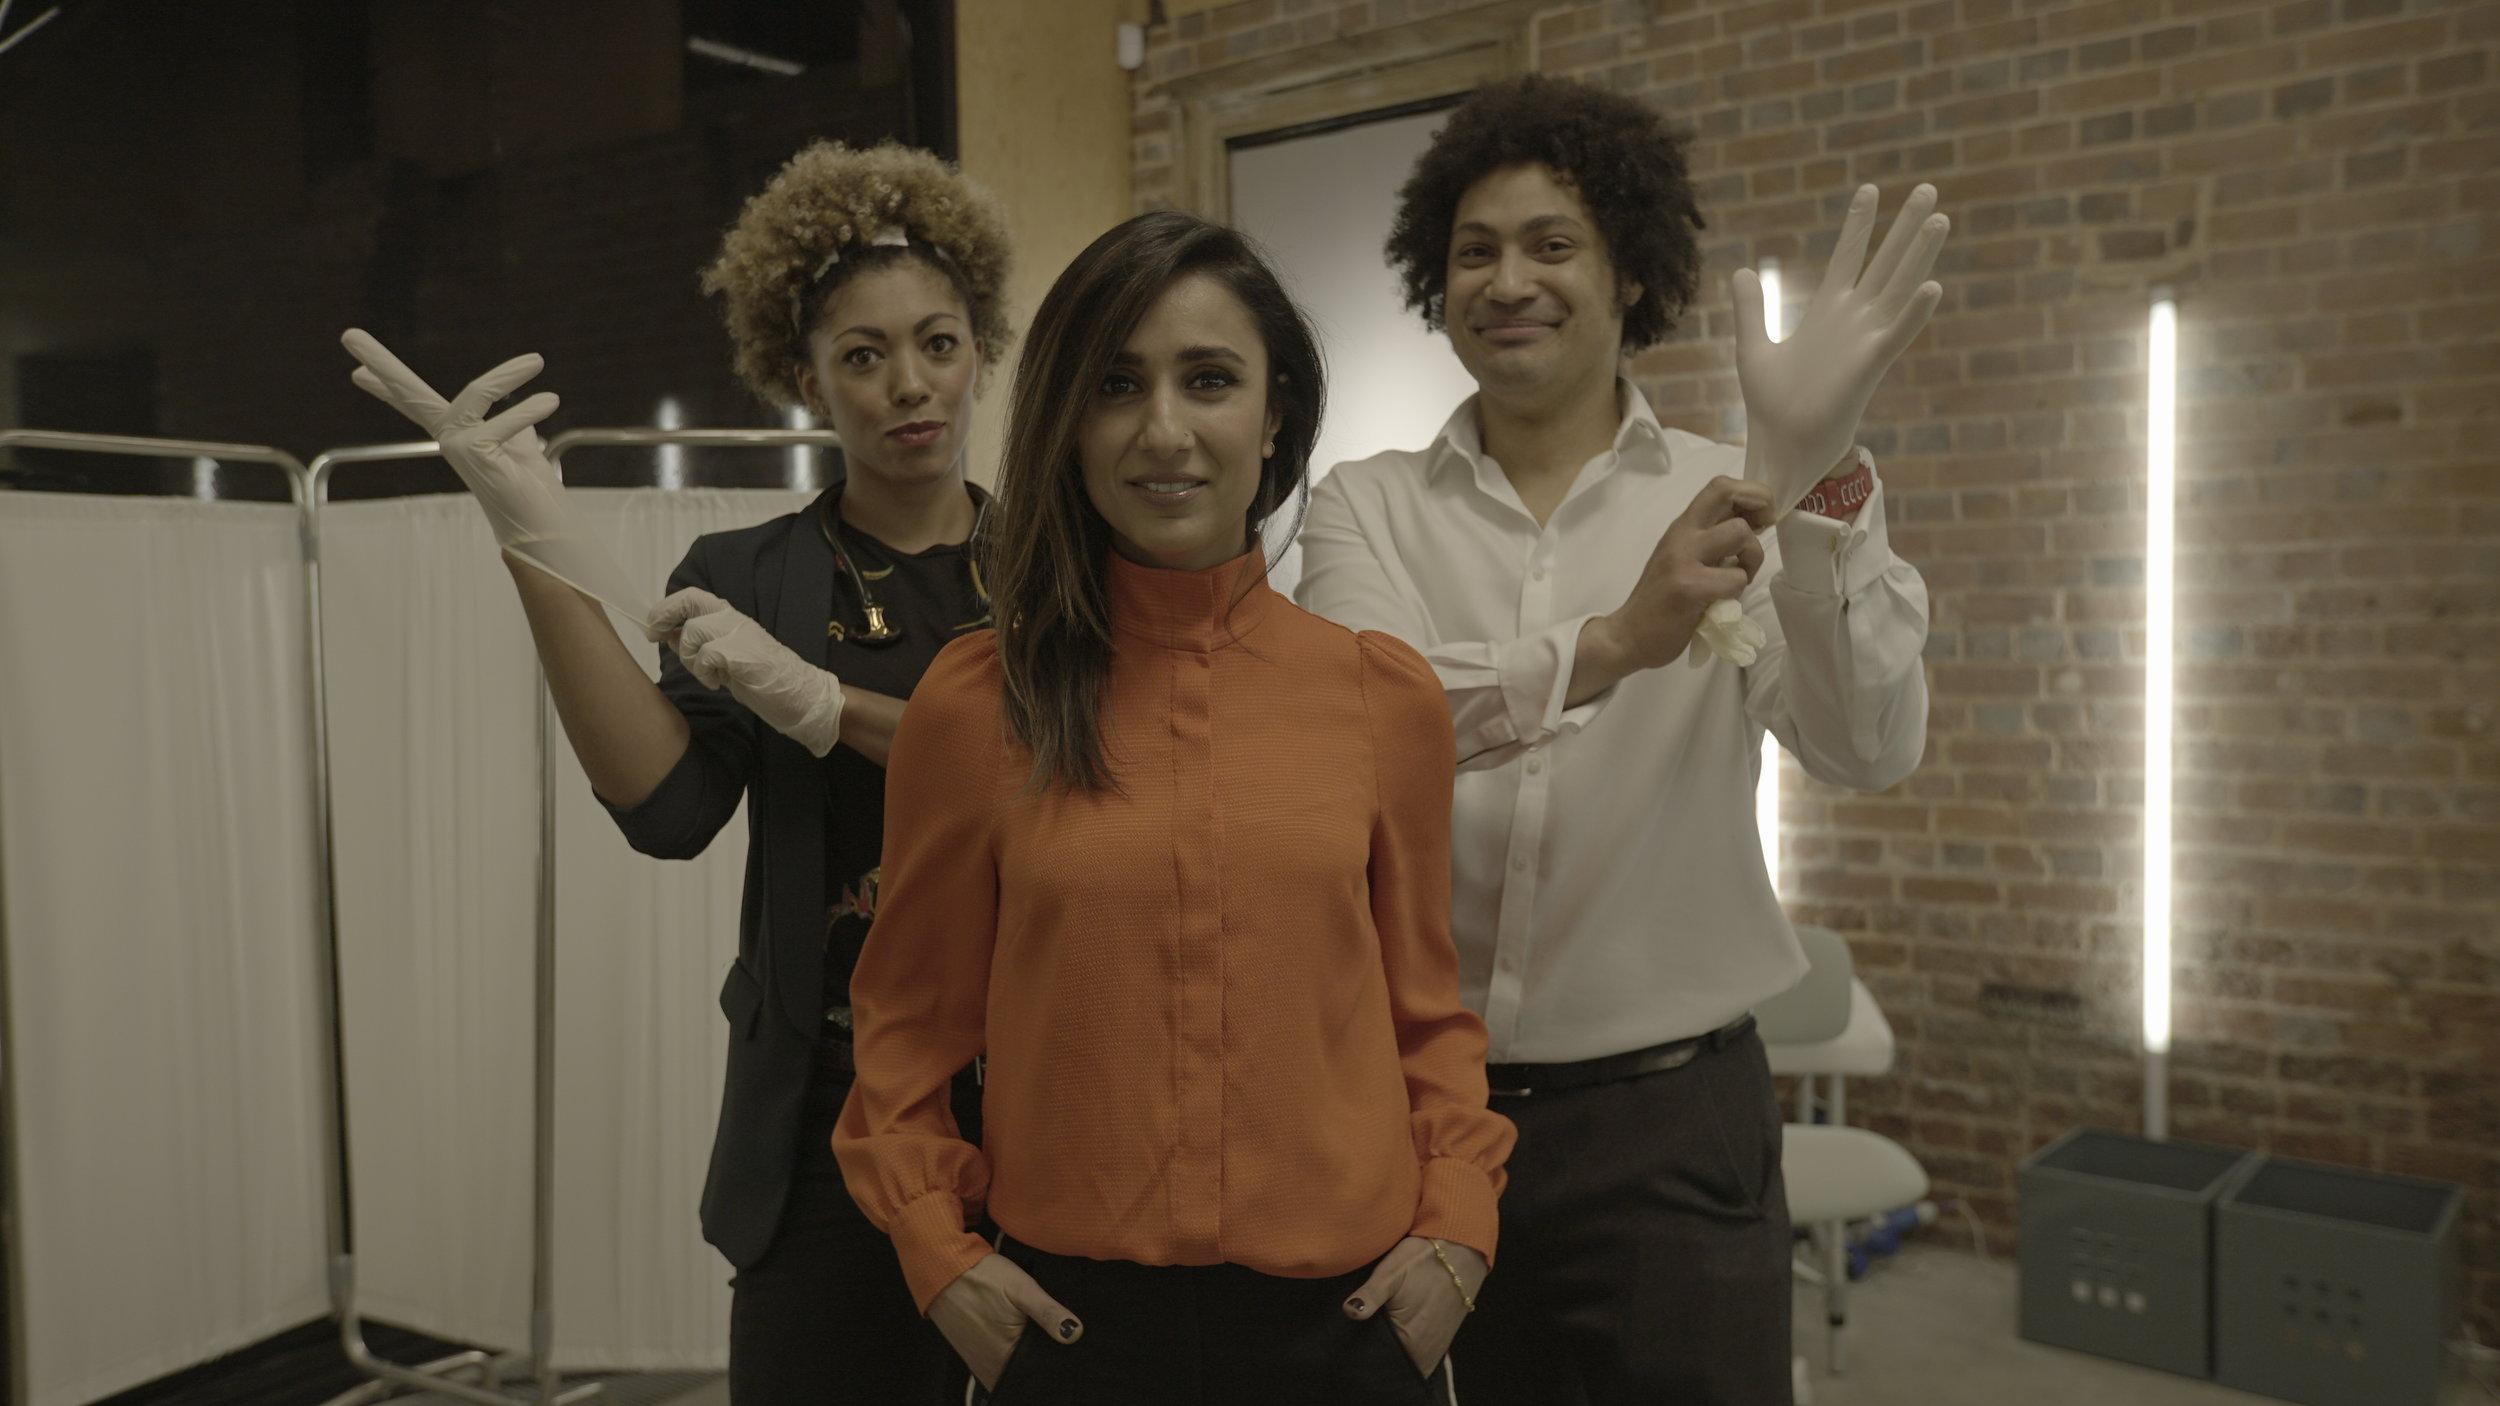 Anita, Zoe & Jason Gloves 7.JPG